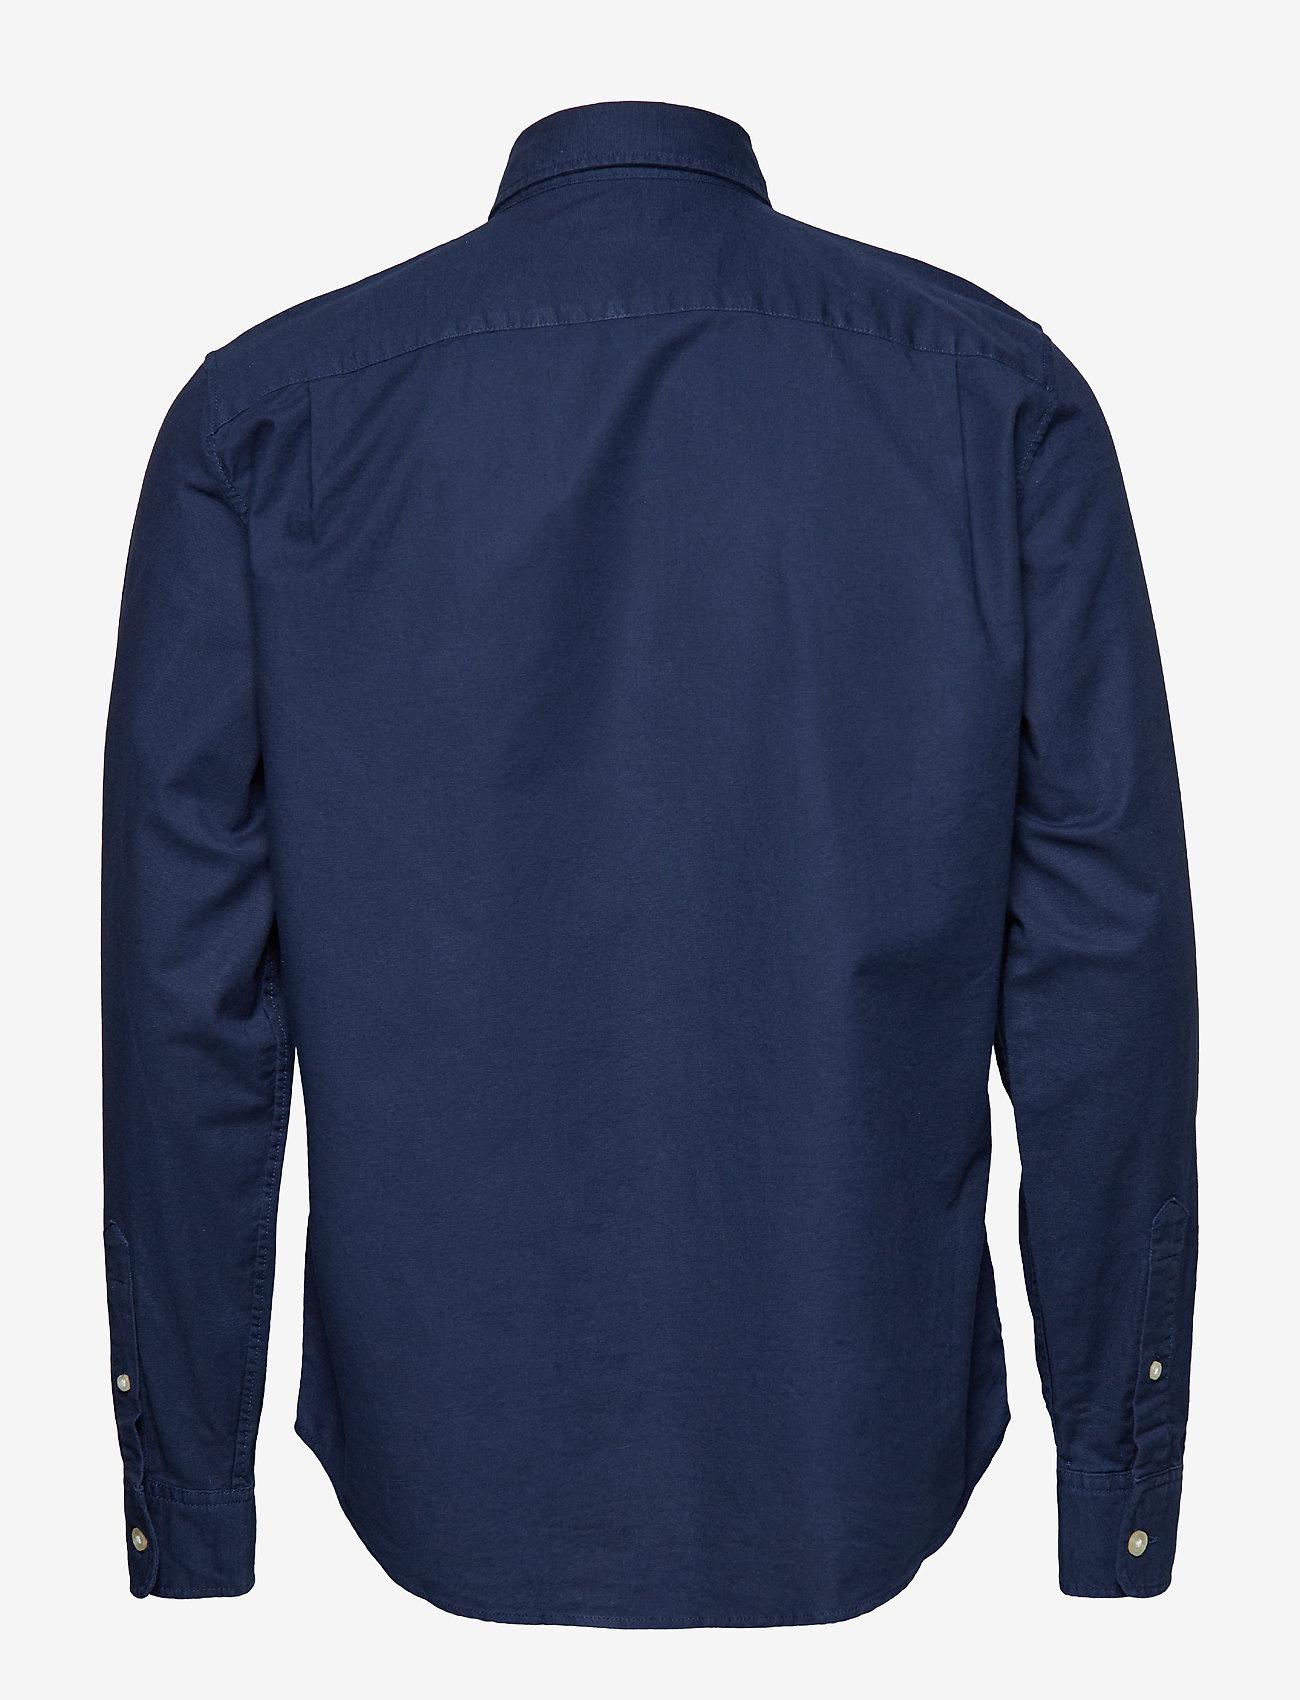 Lived-in Stretch Oxford Shirt (Tapestry Navy) - GAP 51pz7O